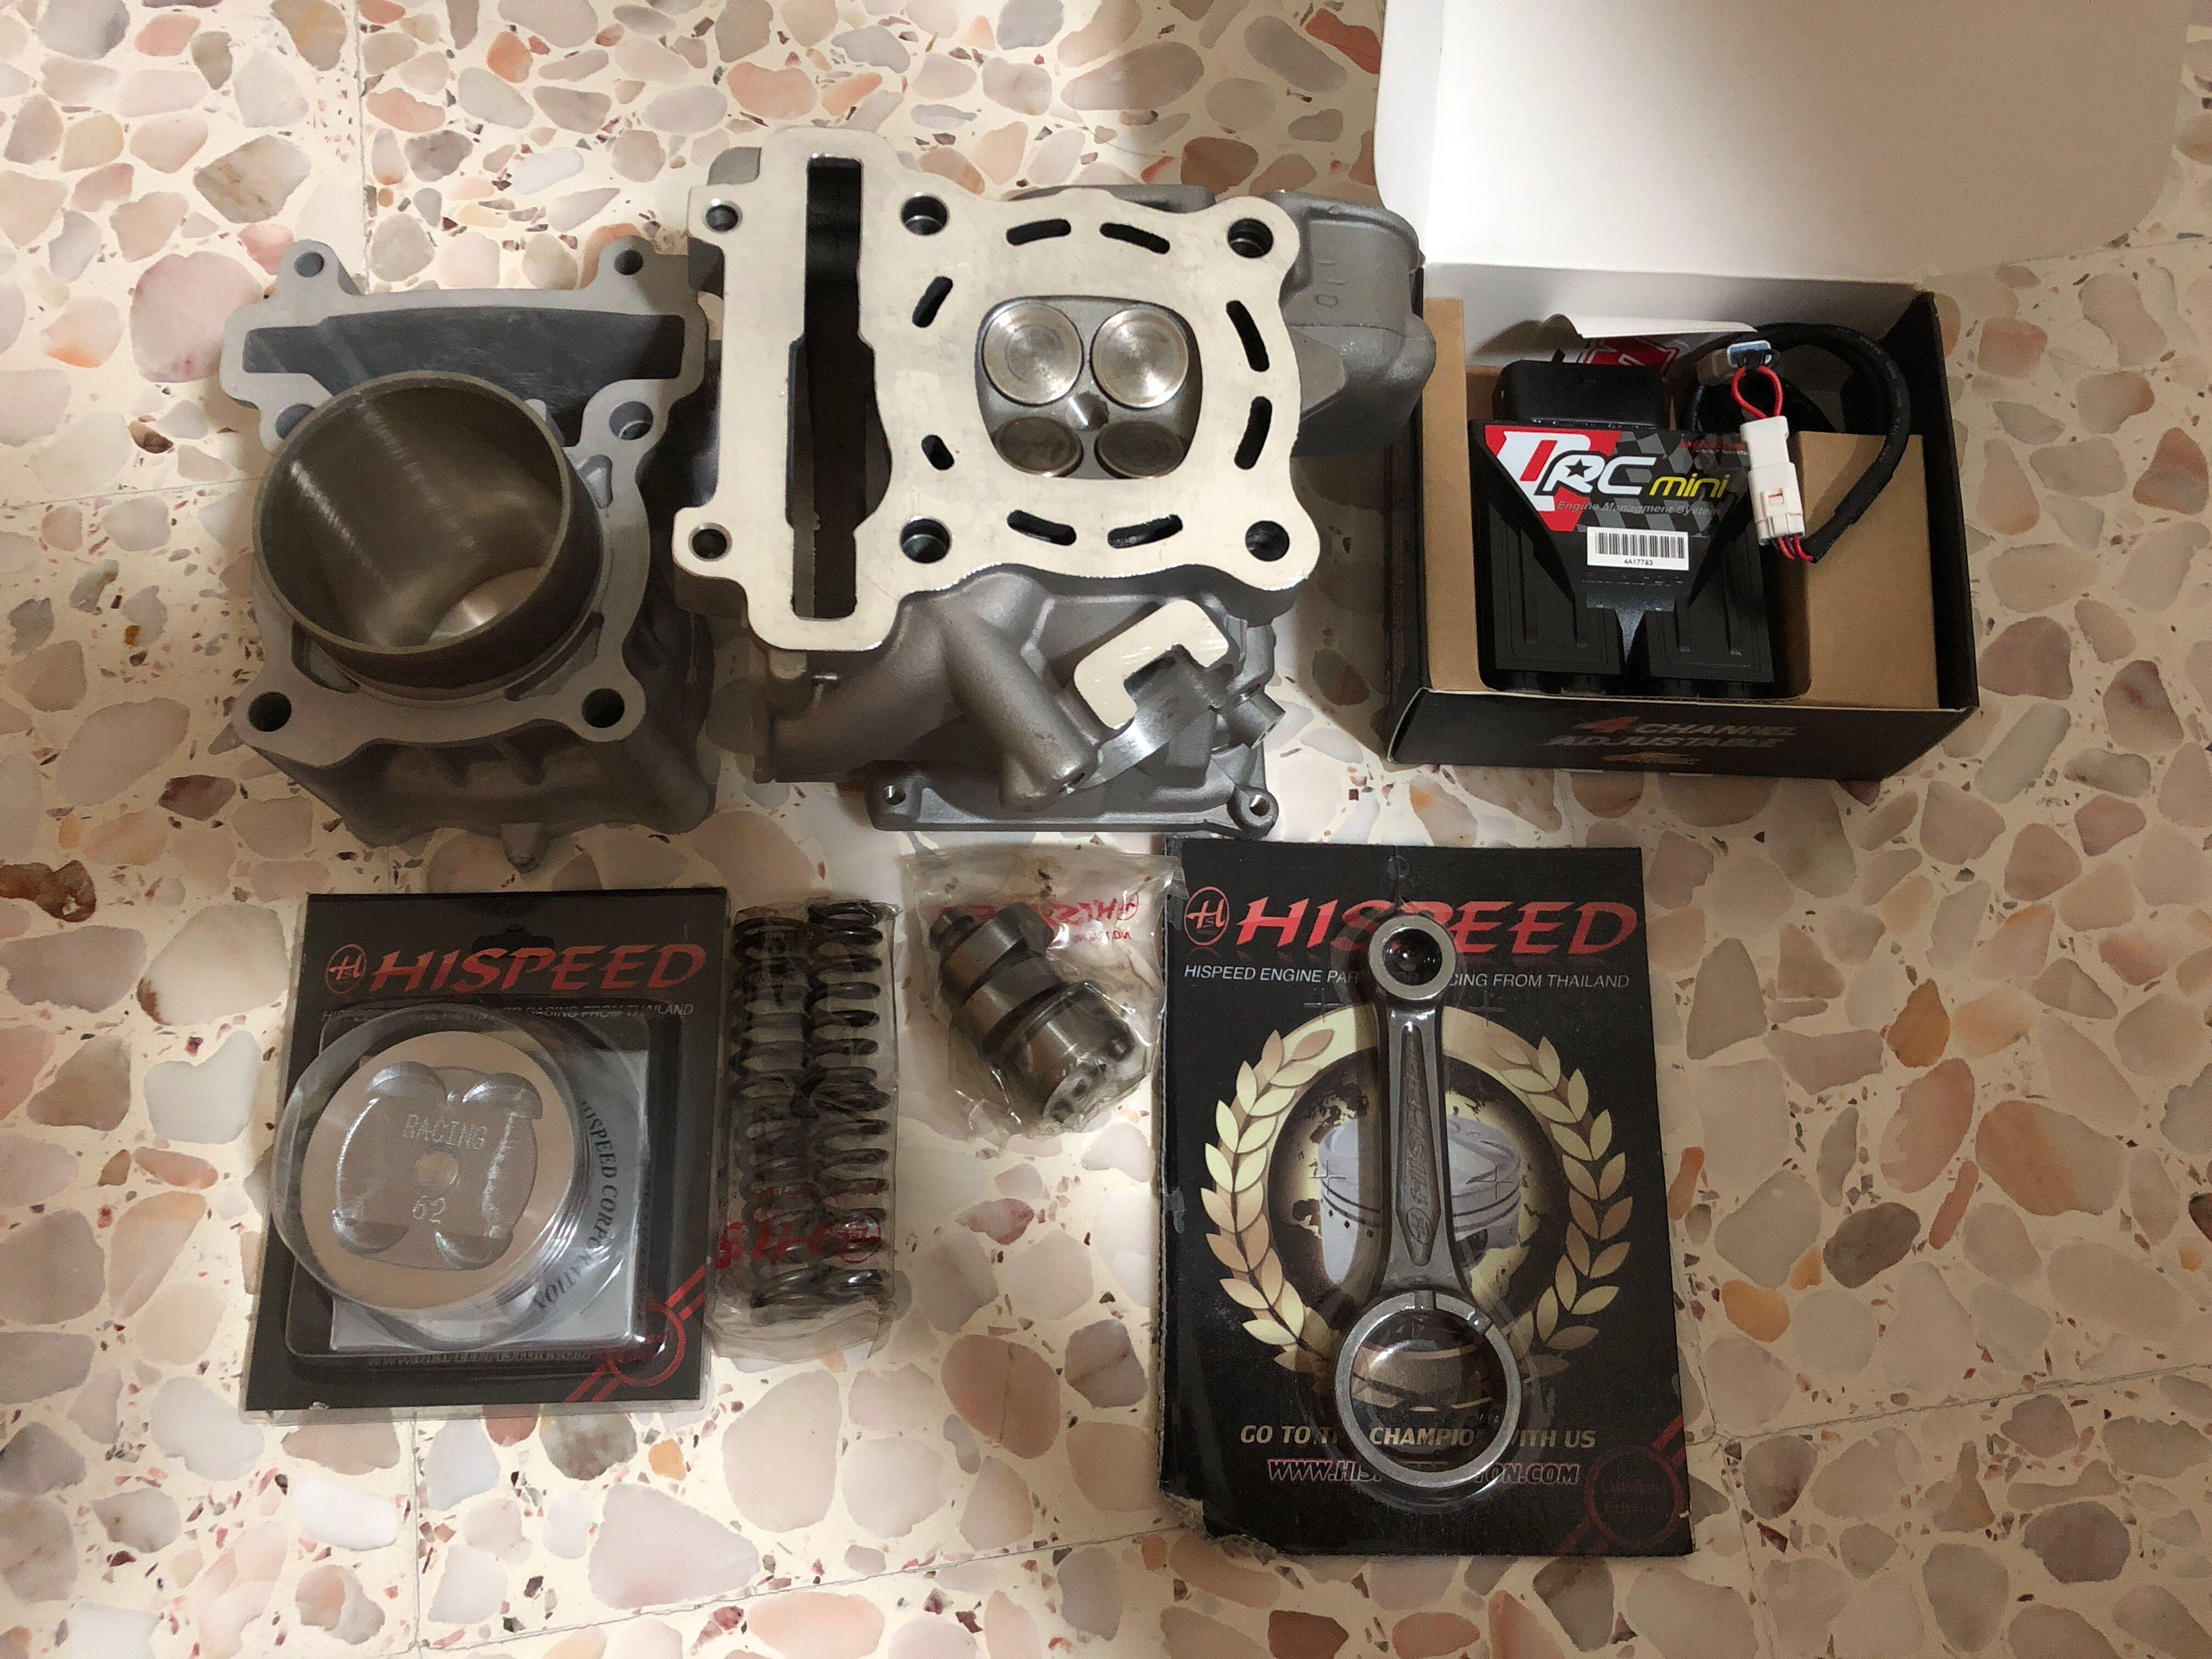 SNIPER150 RACING BLOCK, Motorbikes, Motorbike Accessories on